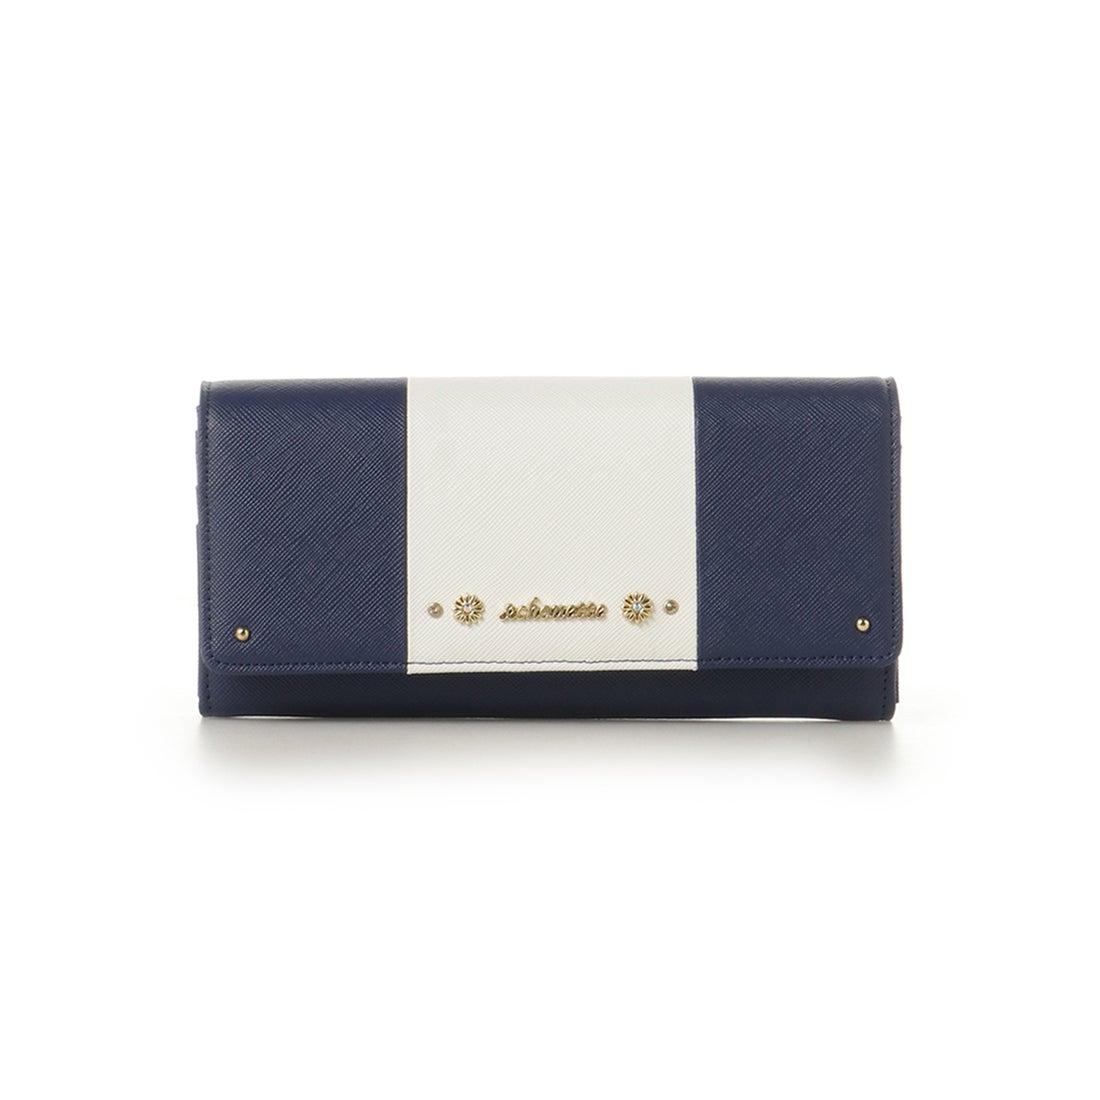 db71e298381f & chouette &シュエット バイカラーフラップ財布 ネイビー -靴&ファッション通販 ロコンド〜自宅で試着、気軽に返品